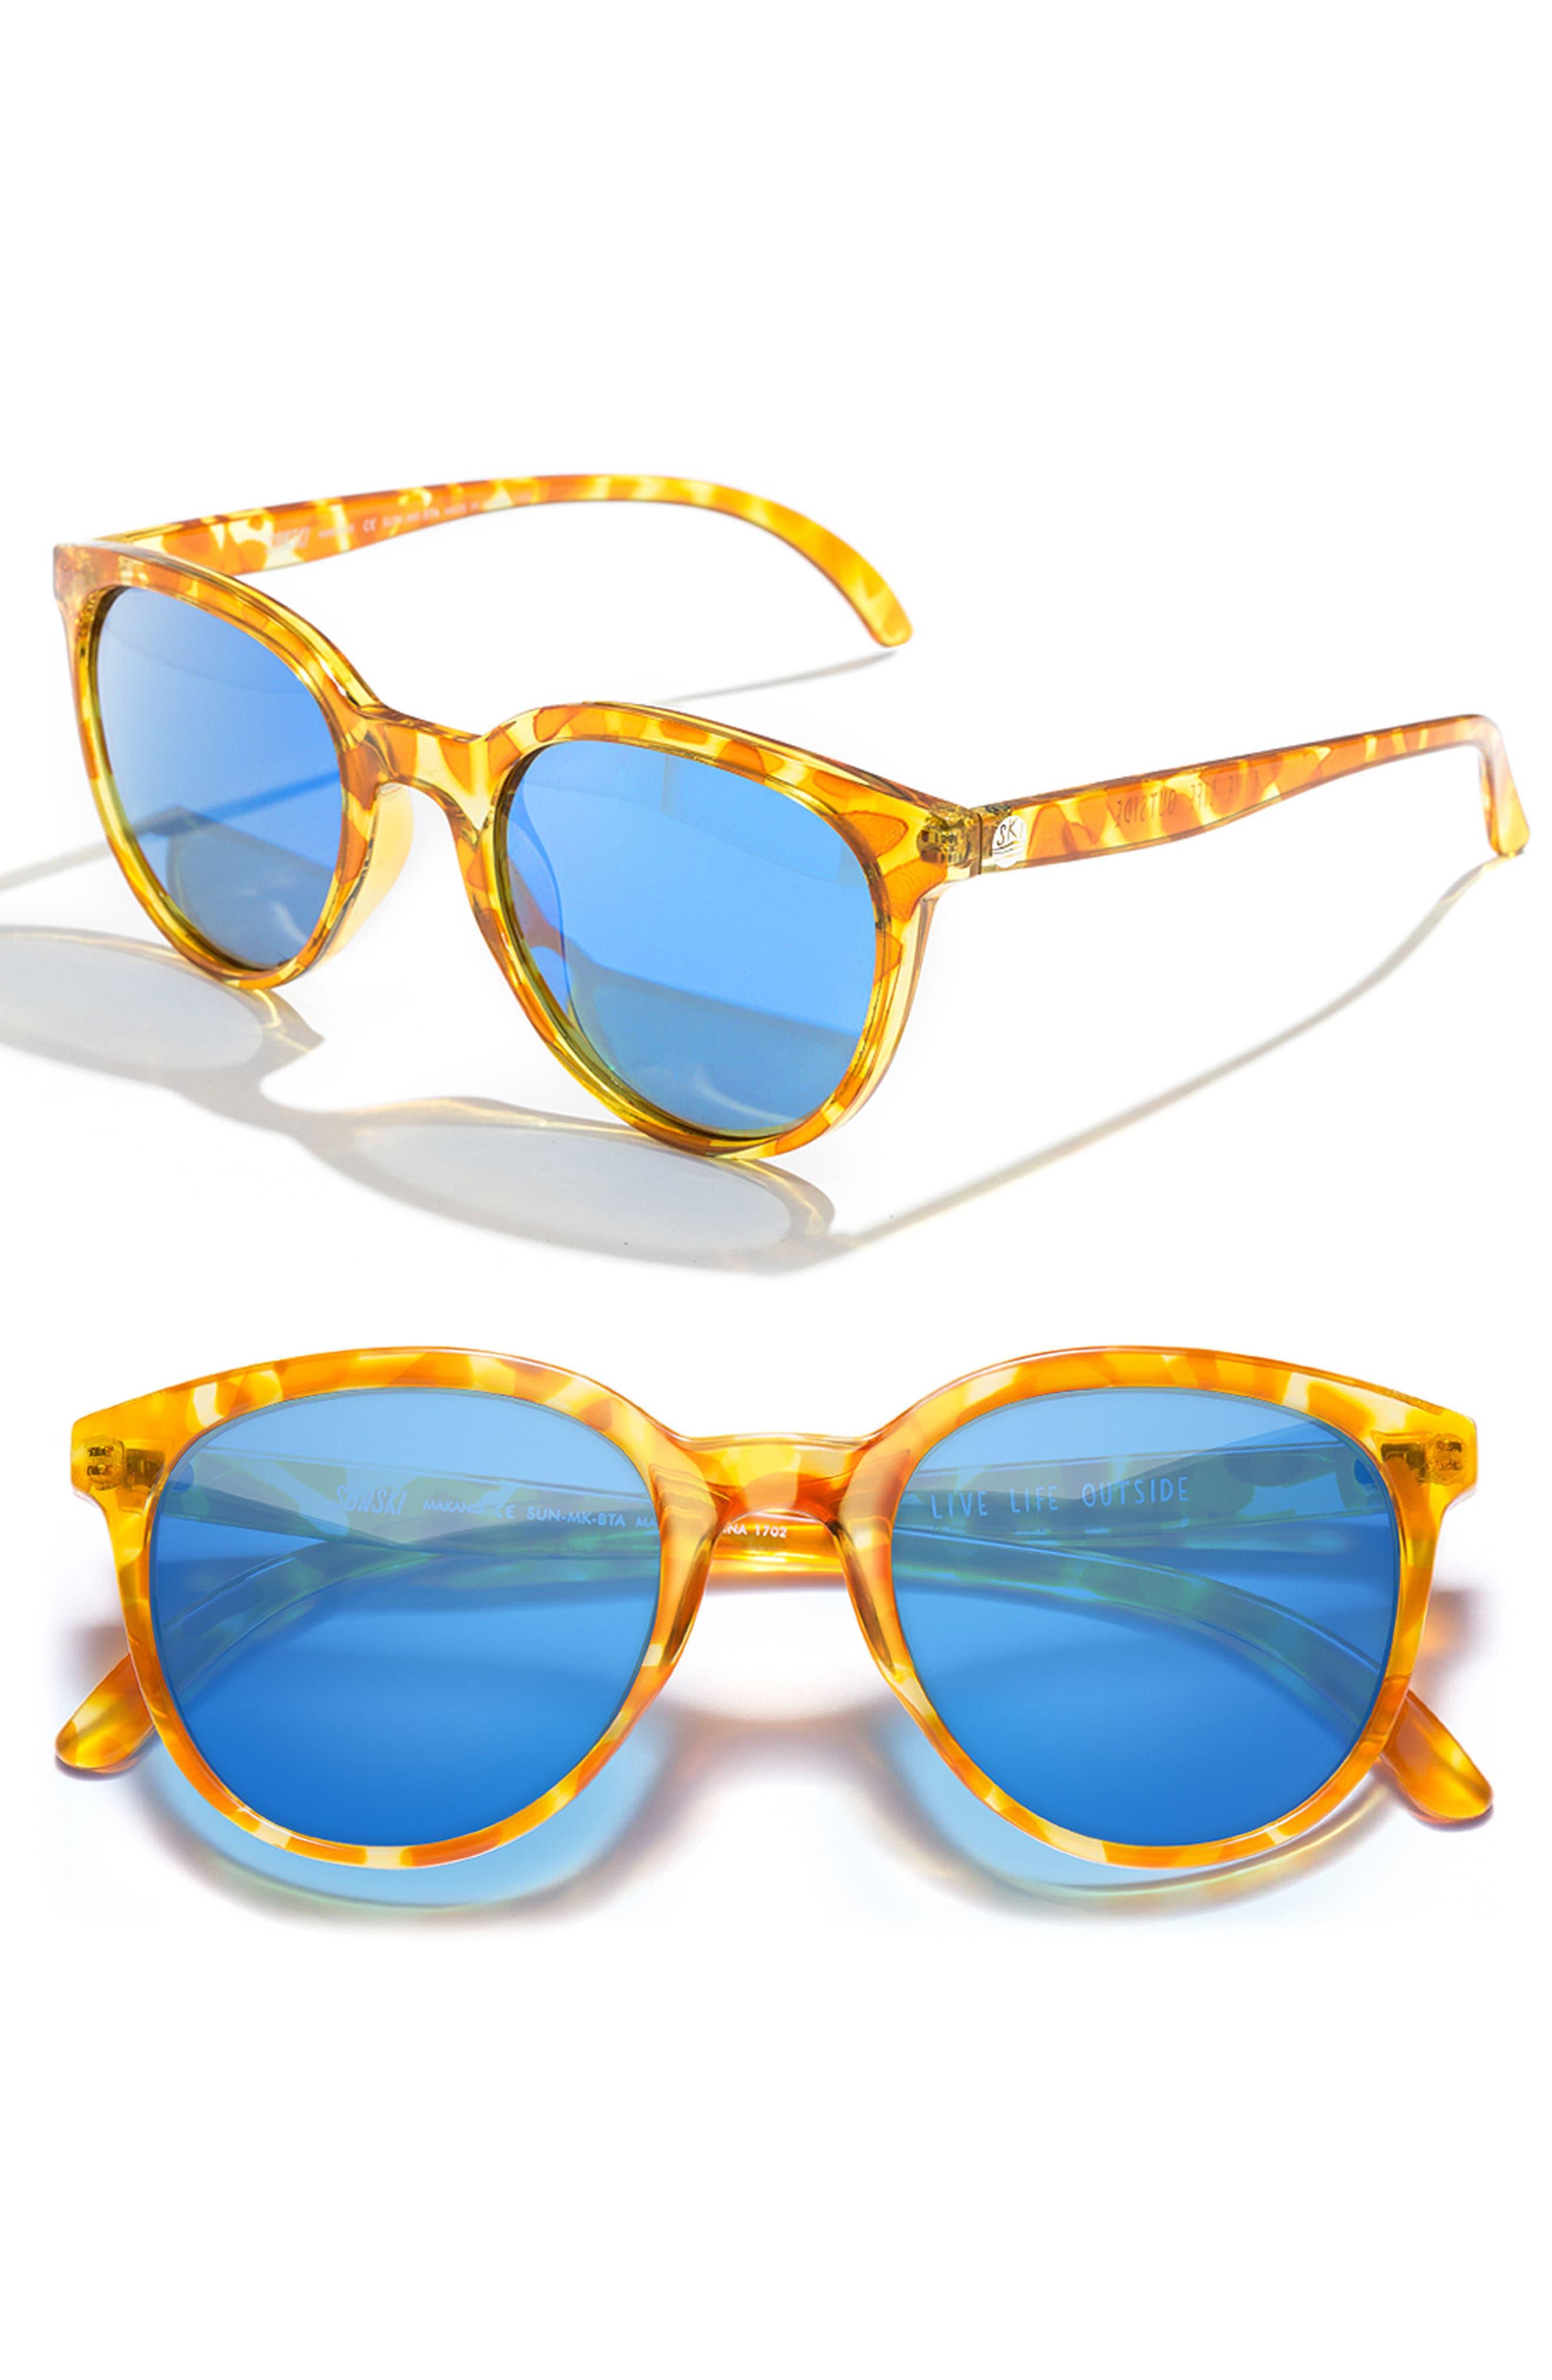 Makani 51mm Mirrored Polarized Sunglasses,                         Main,                         color, Blond Tortoise/ Aqua